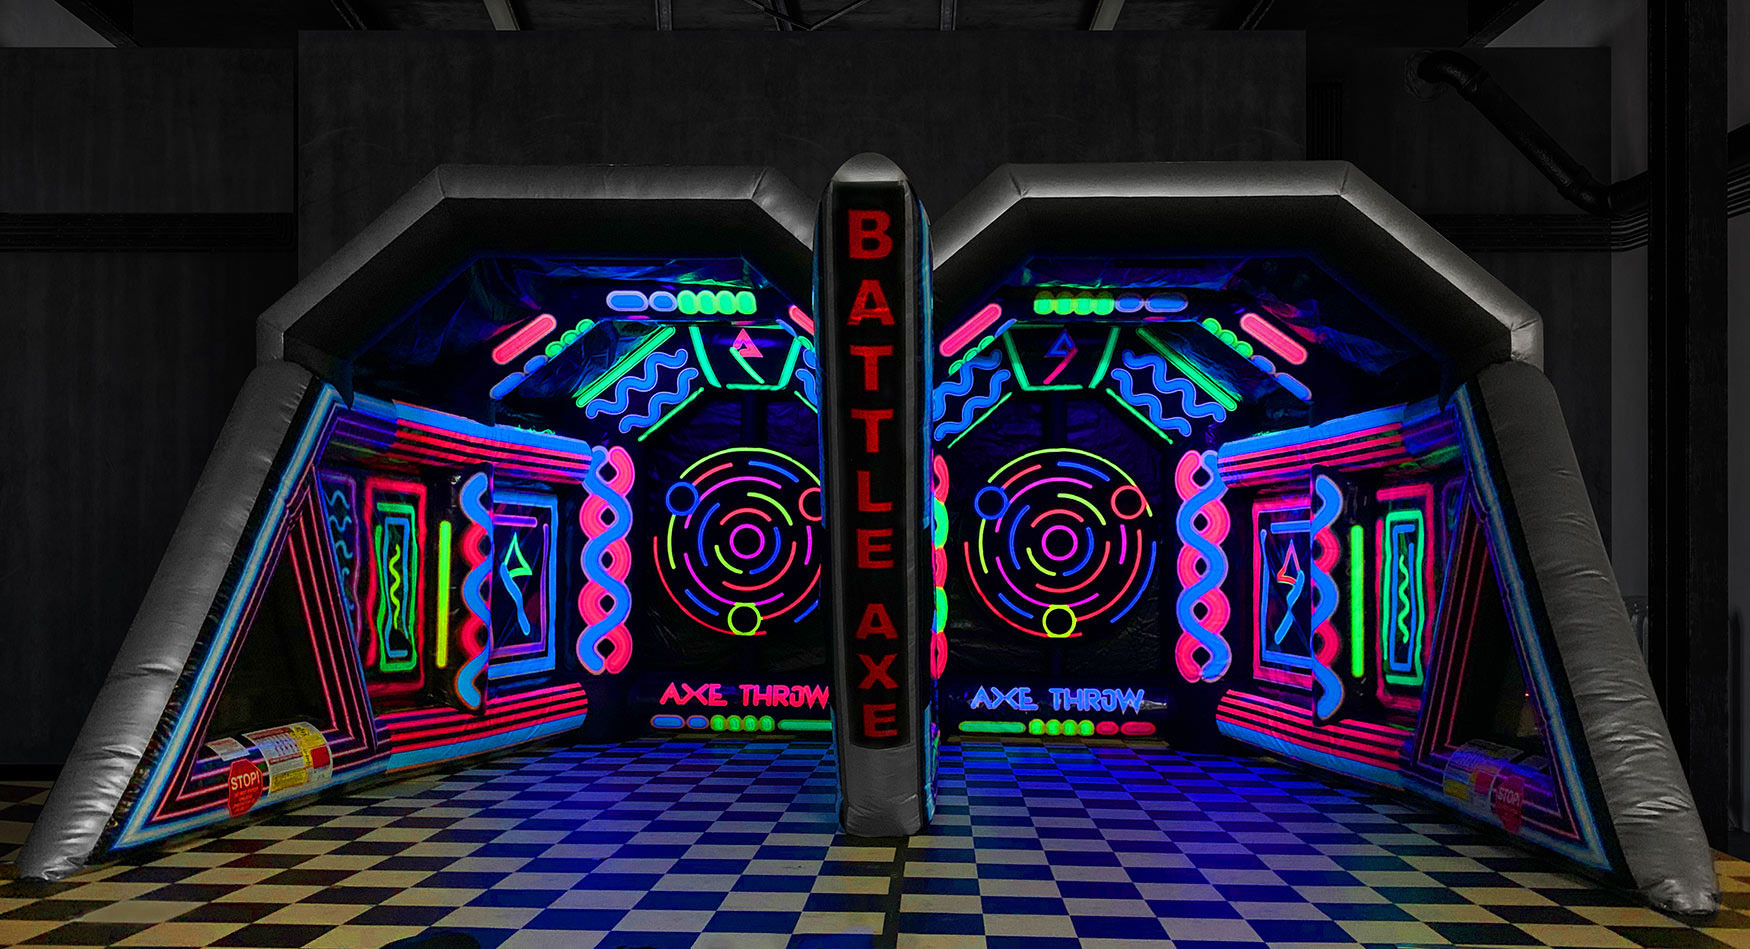 Rent Battle Axe Game Inflatable Black Light